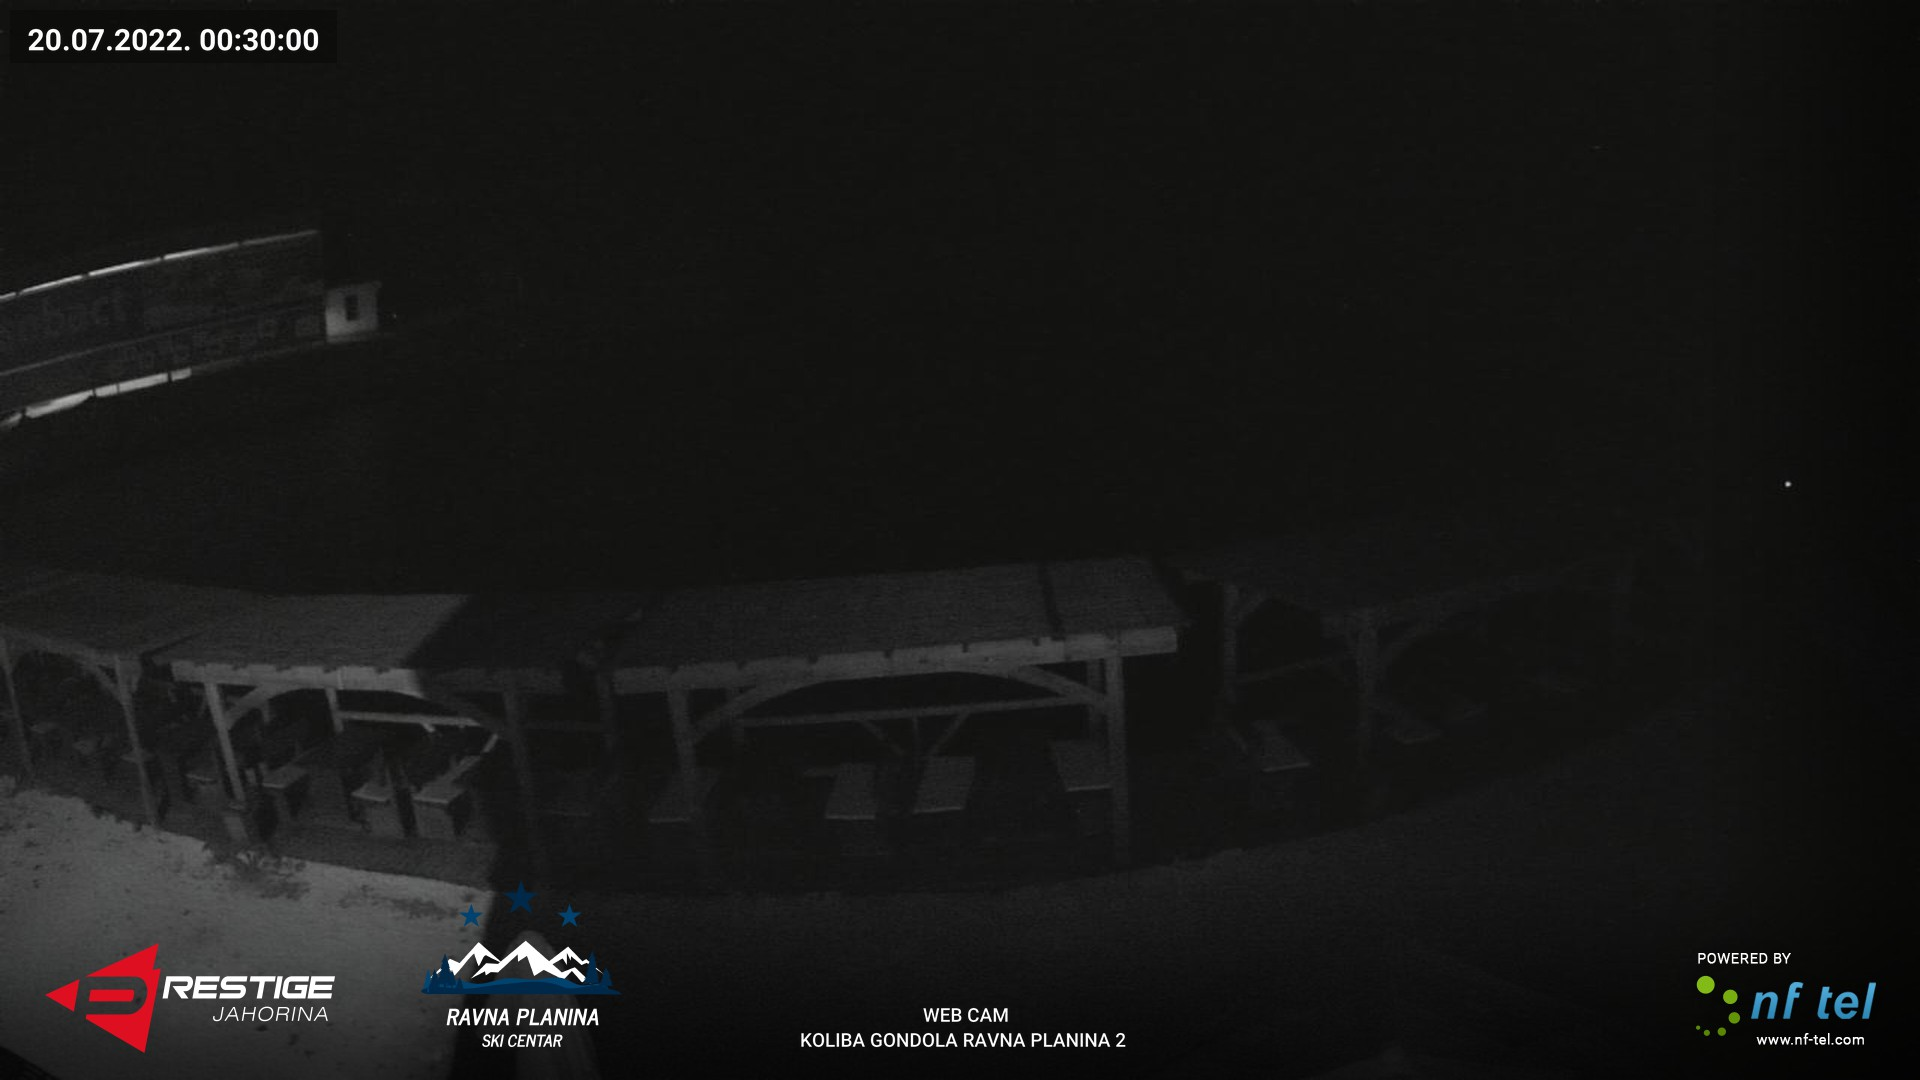 Web Cam Gondola - Ravna planina